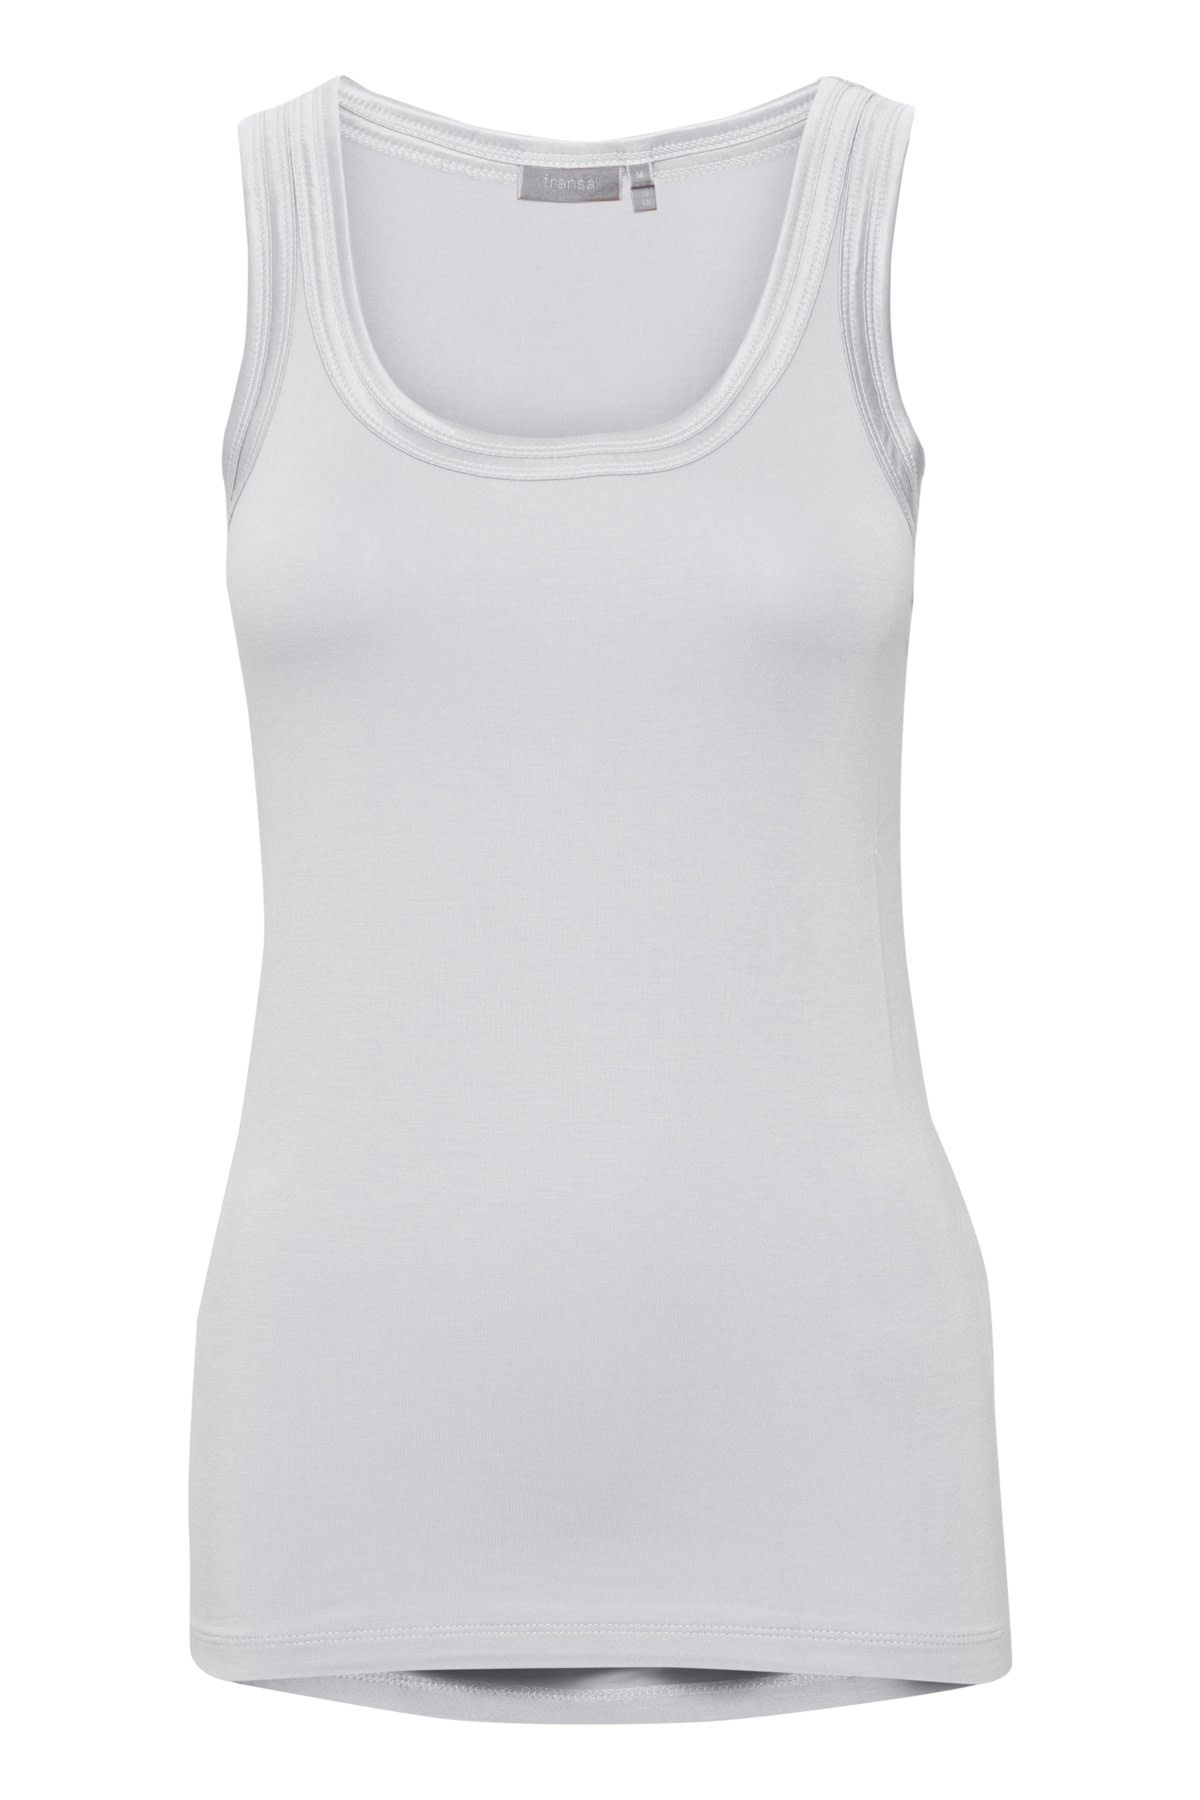 Zulu Tank Top - White